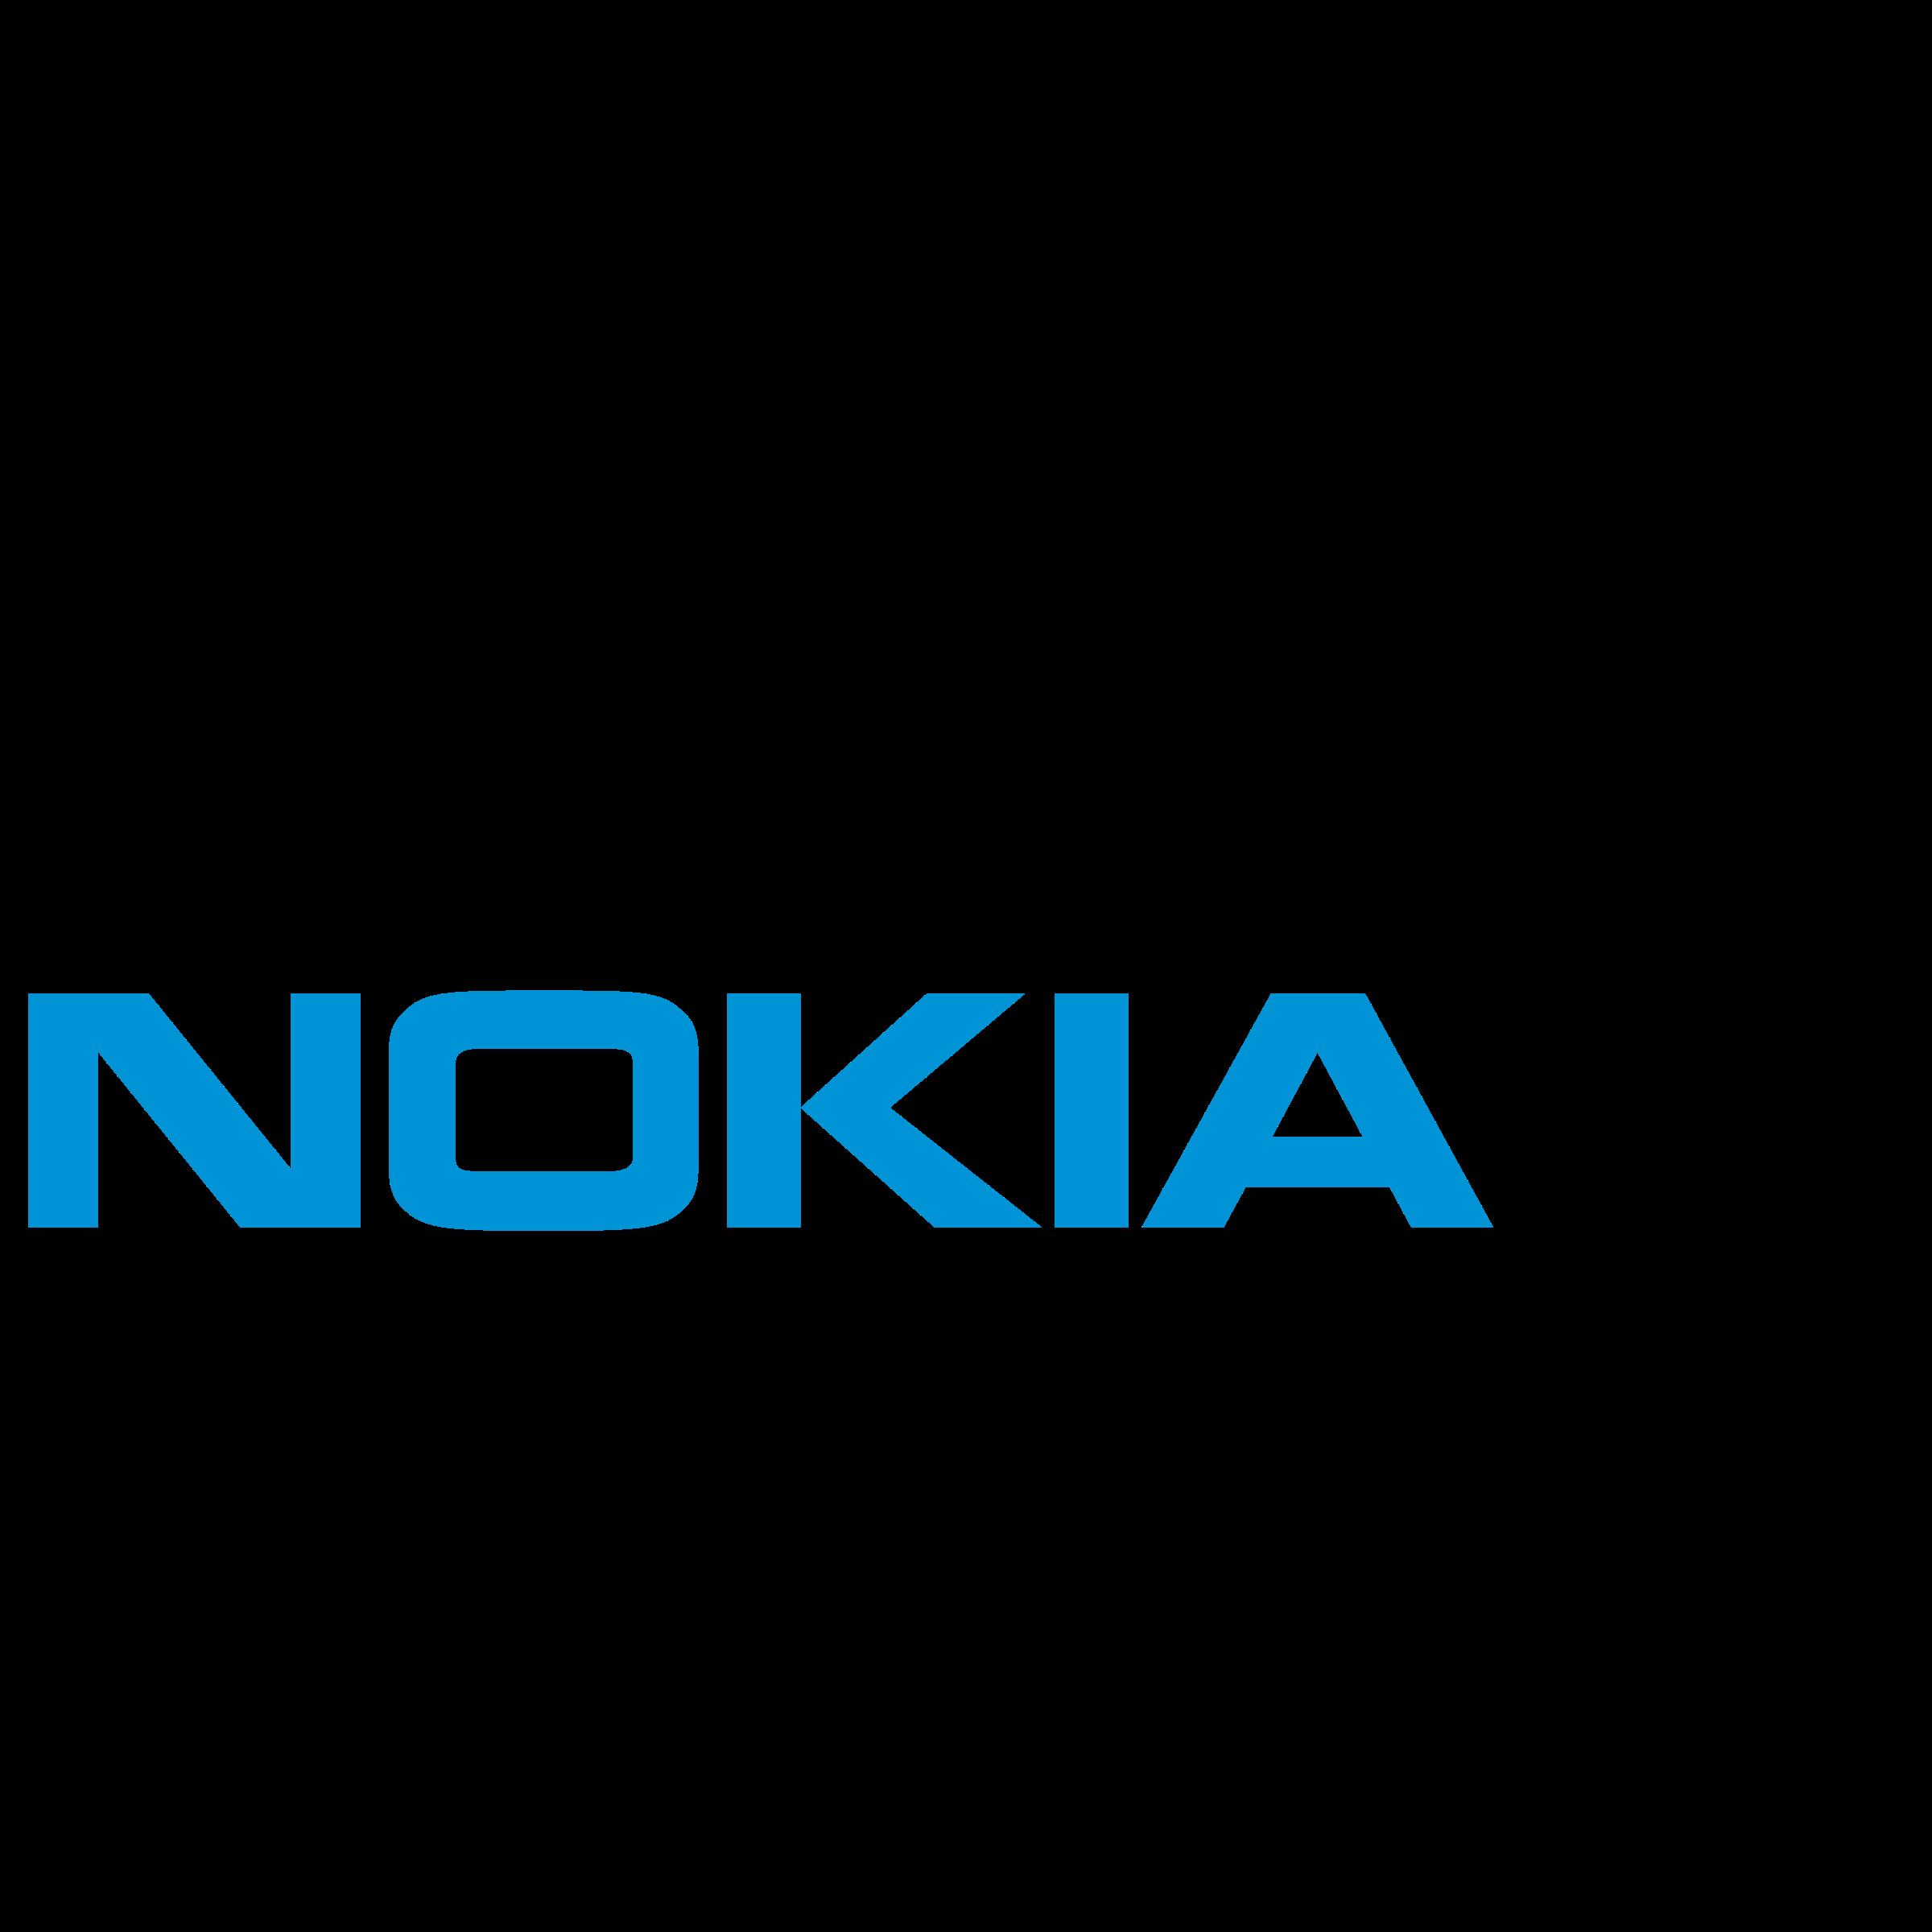 Nokia Logo PNG Transparent & SVG Vector.